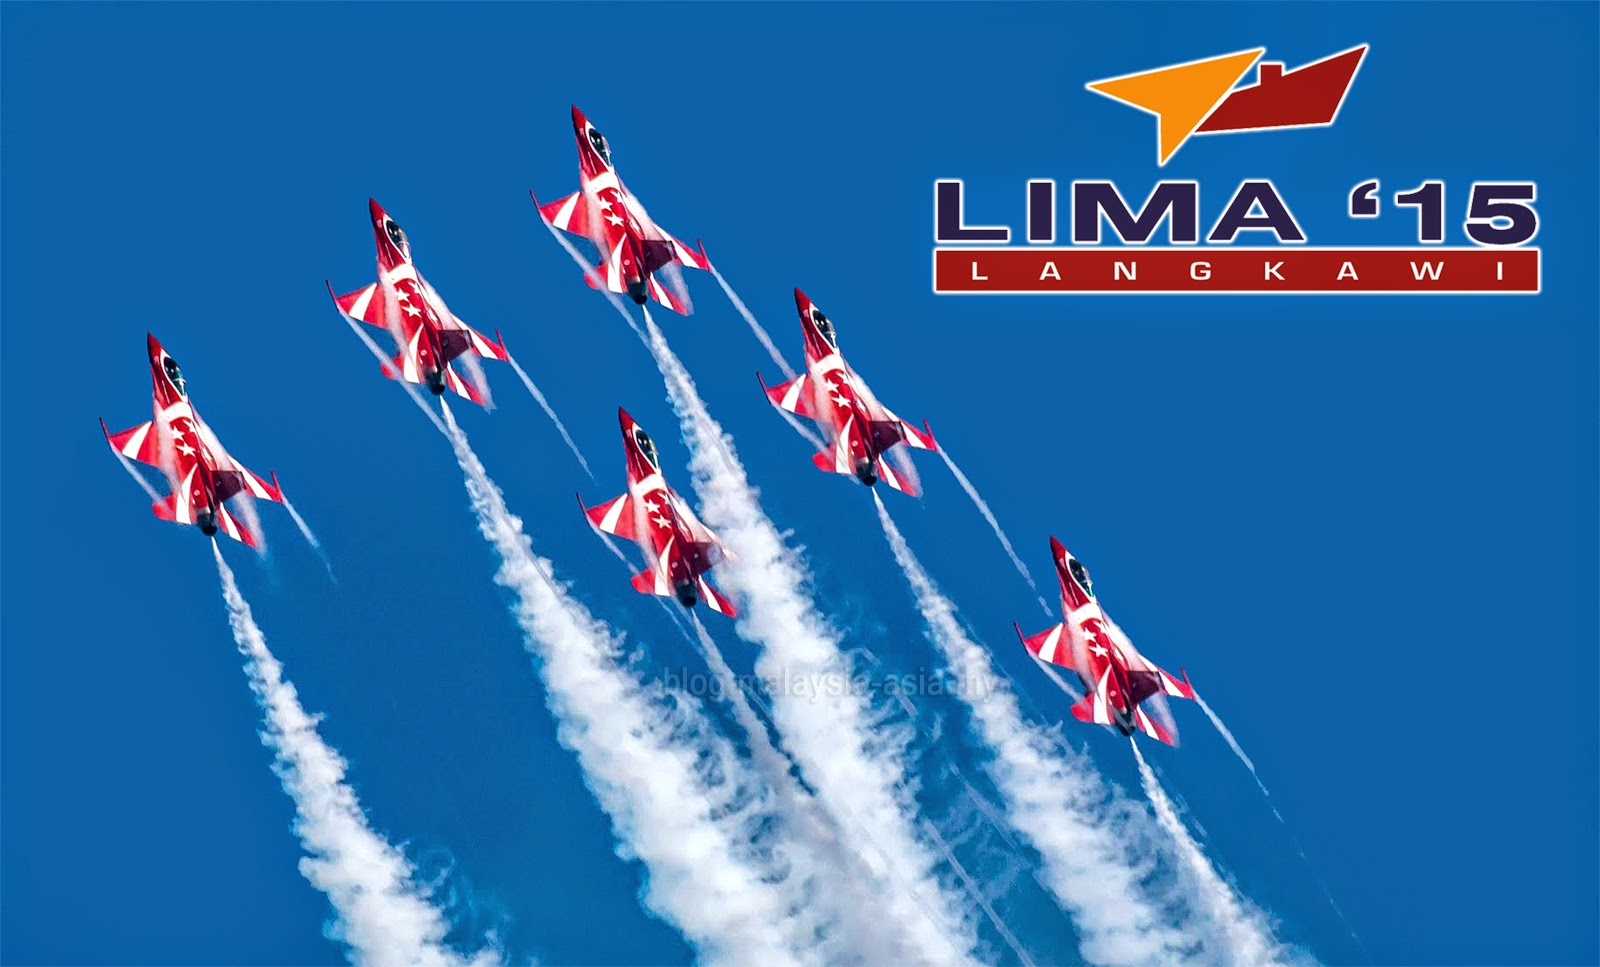 Photos of LIMA'15